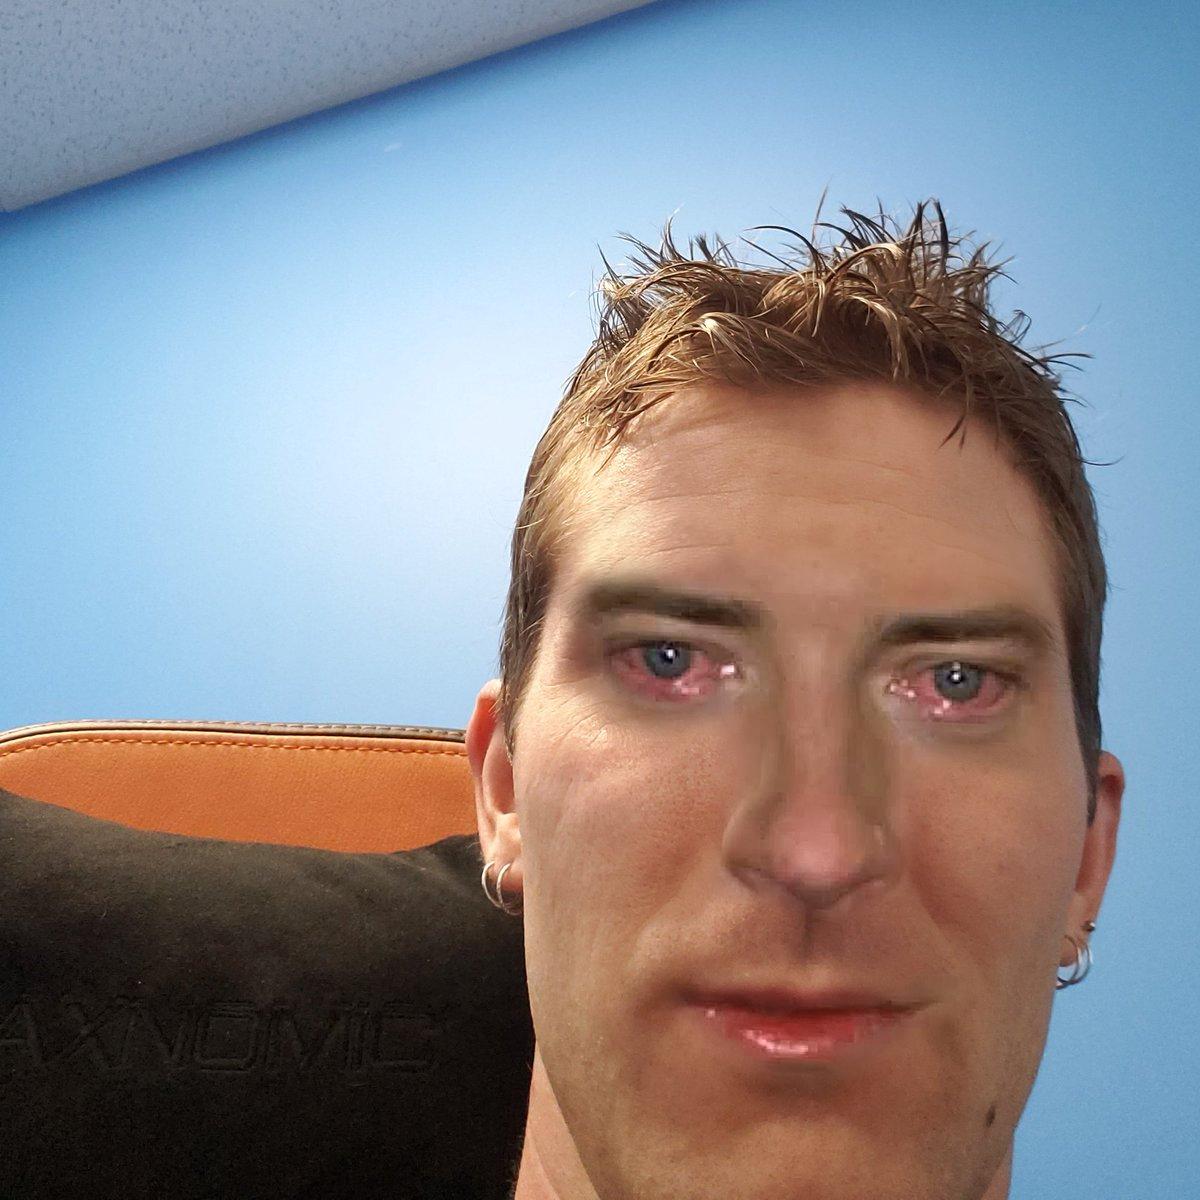 Just Linus Selfie Know Your Meme